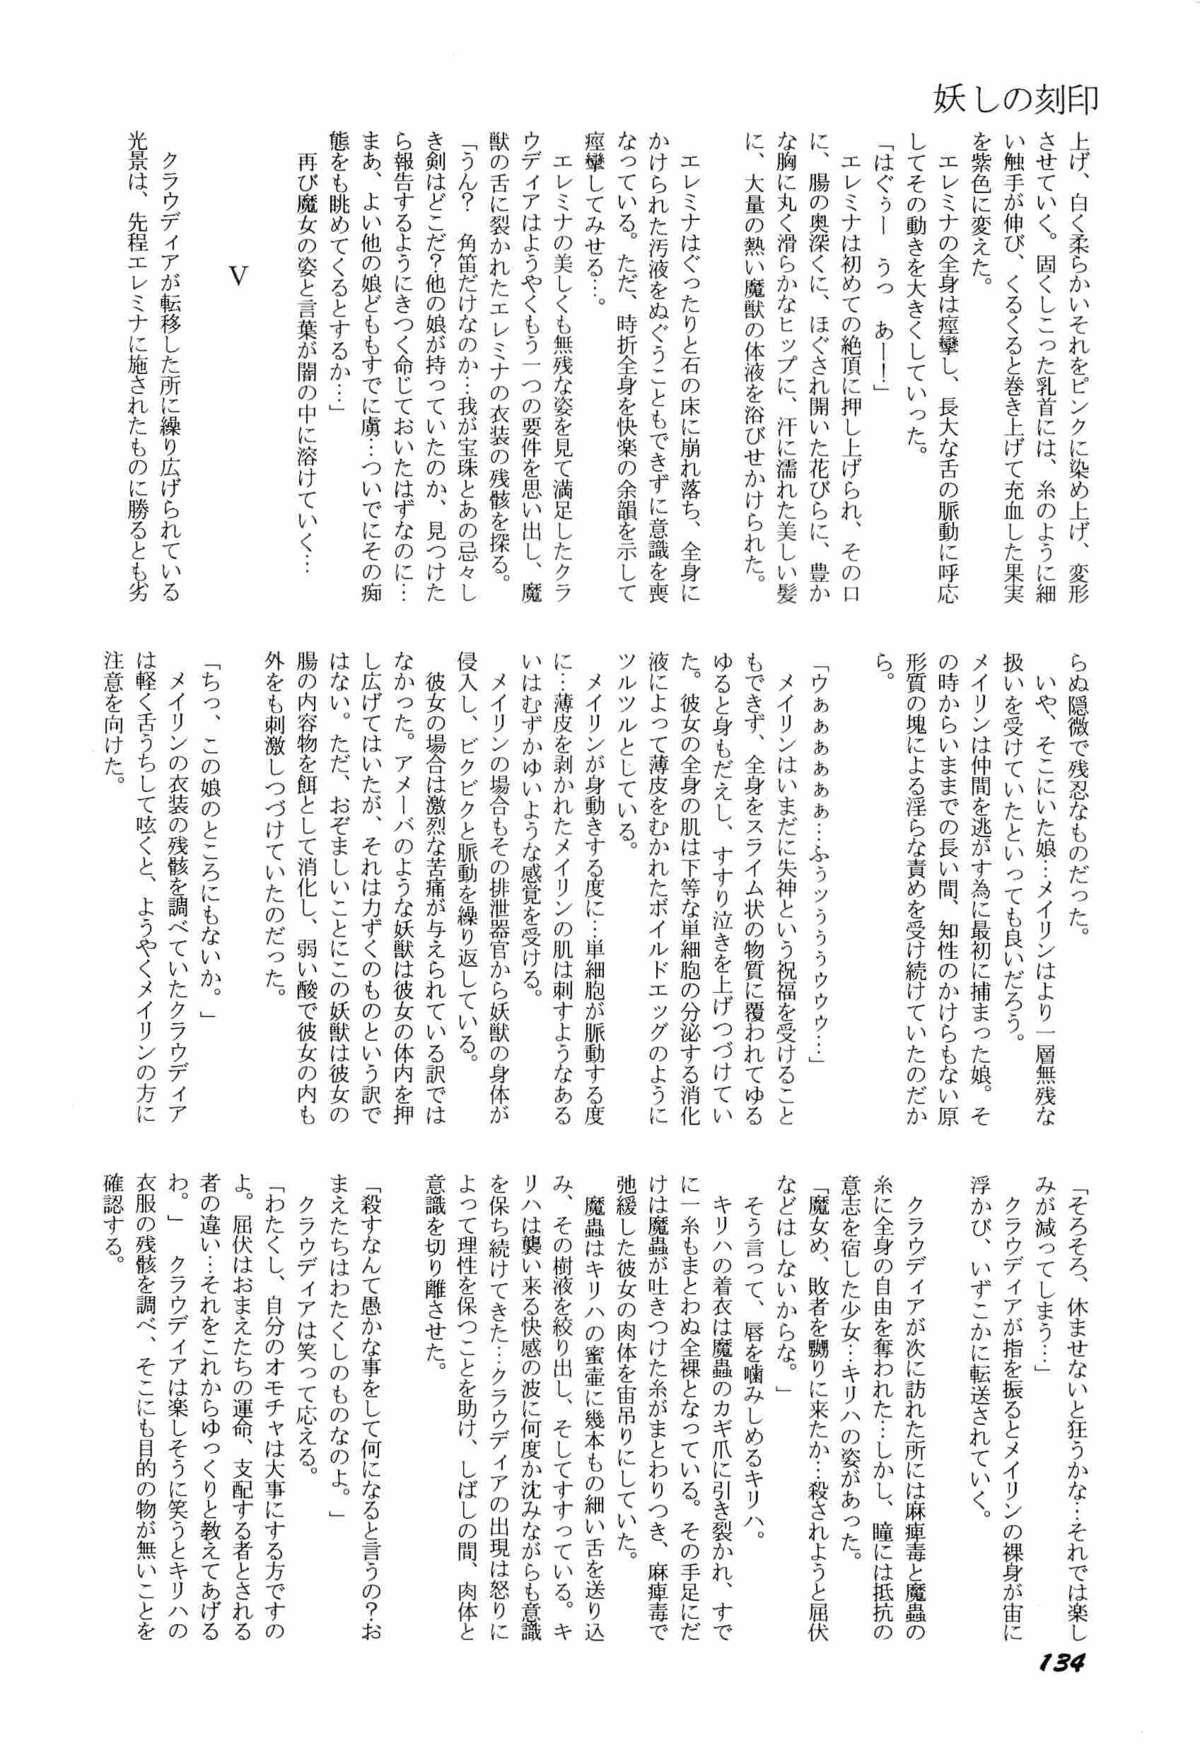 Bisyoujo Anthology '93 jyoukan 136